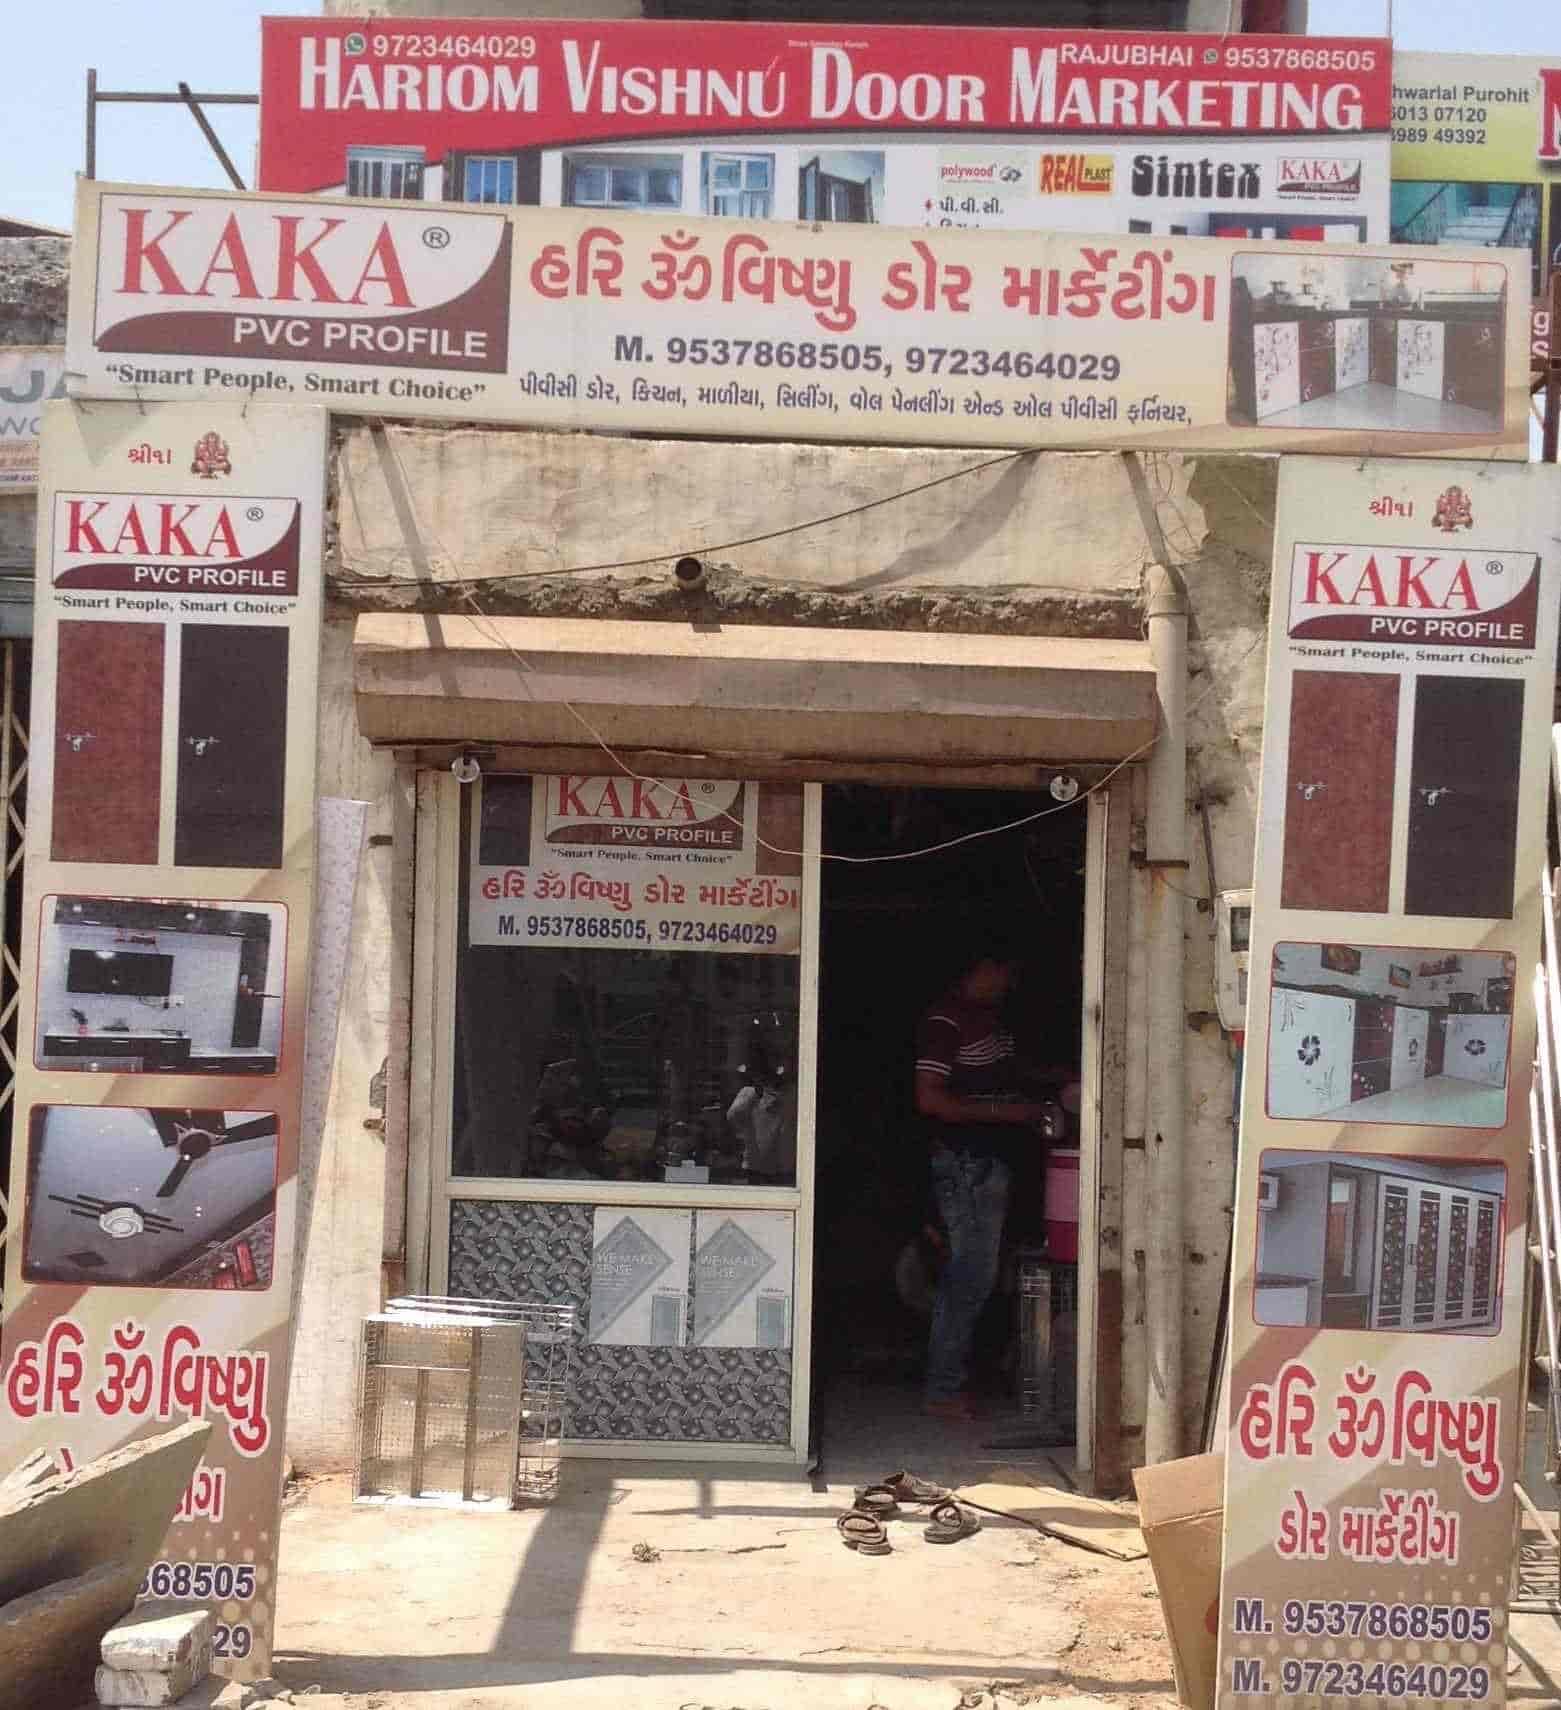 Hariom Vishnu Door Marketing Photos Saraspur Ahmedabad Pictures